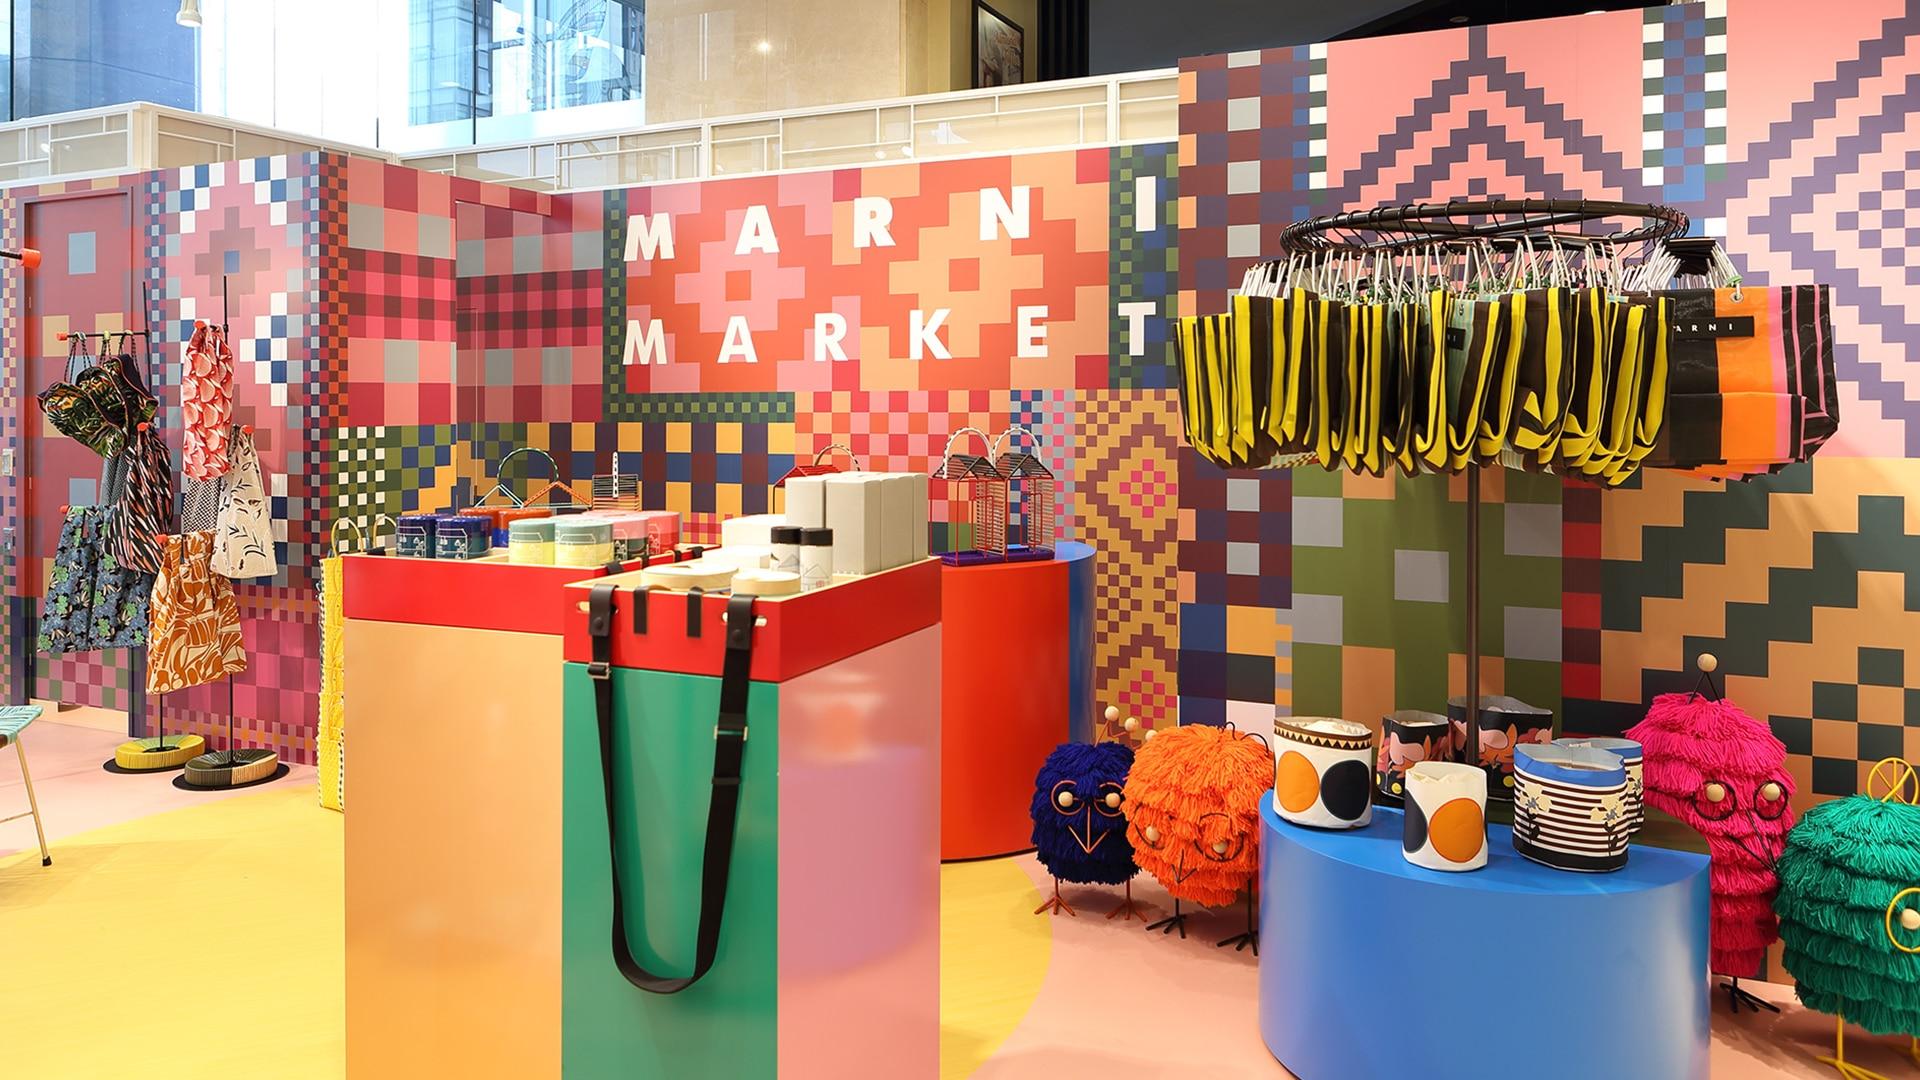 Marni Market pop up in Nagoya and Fukuoka 2017 interior 20.